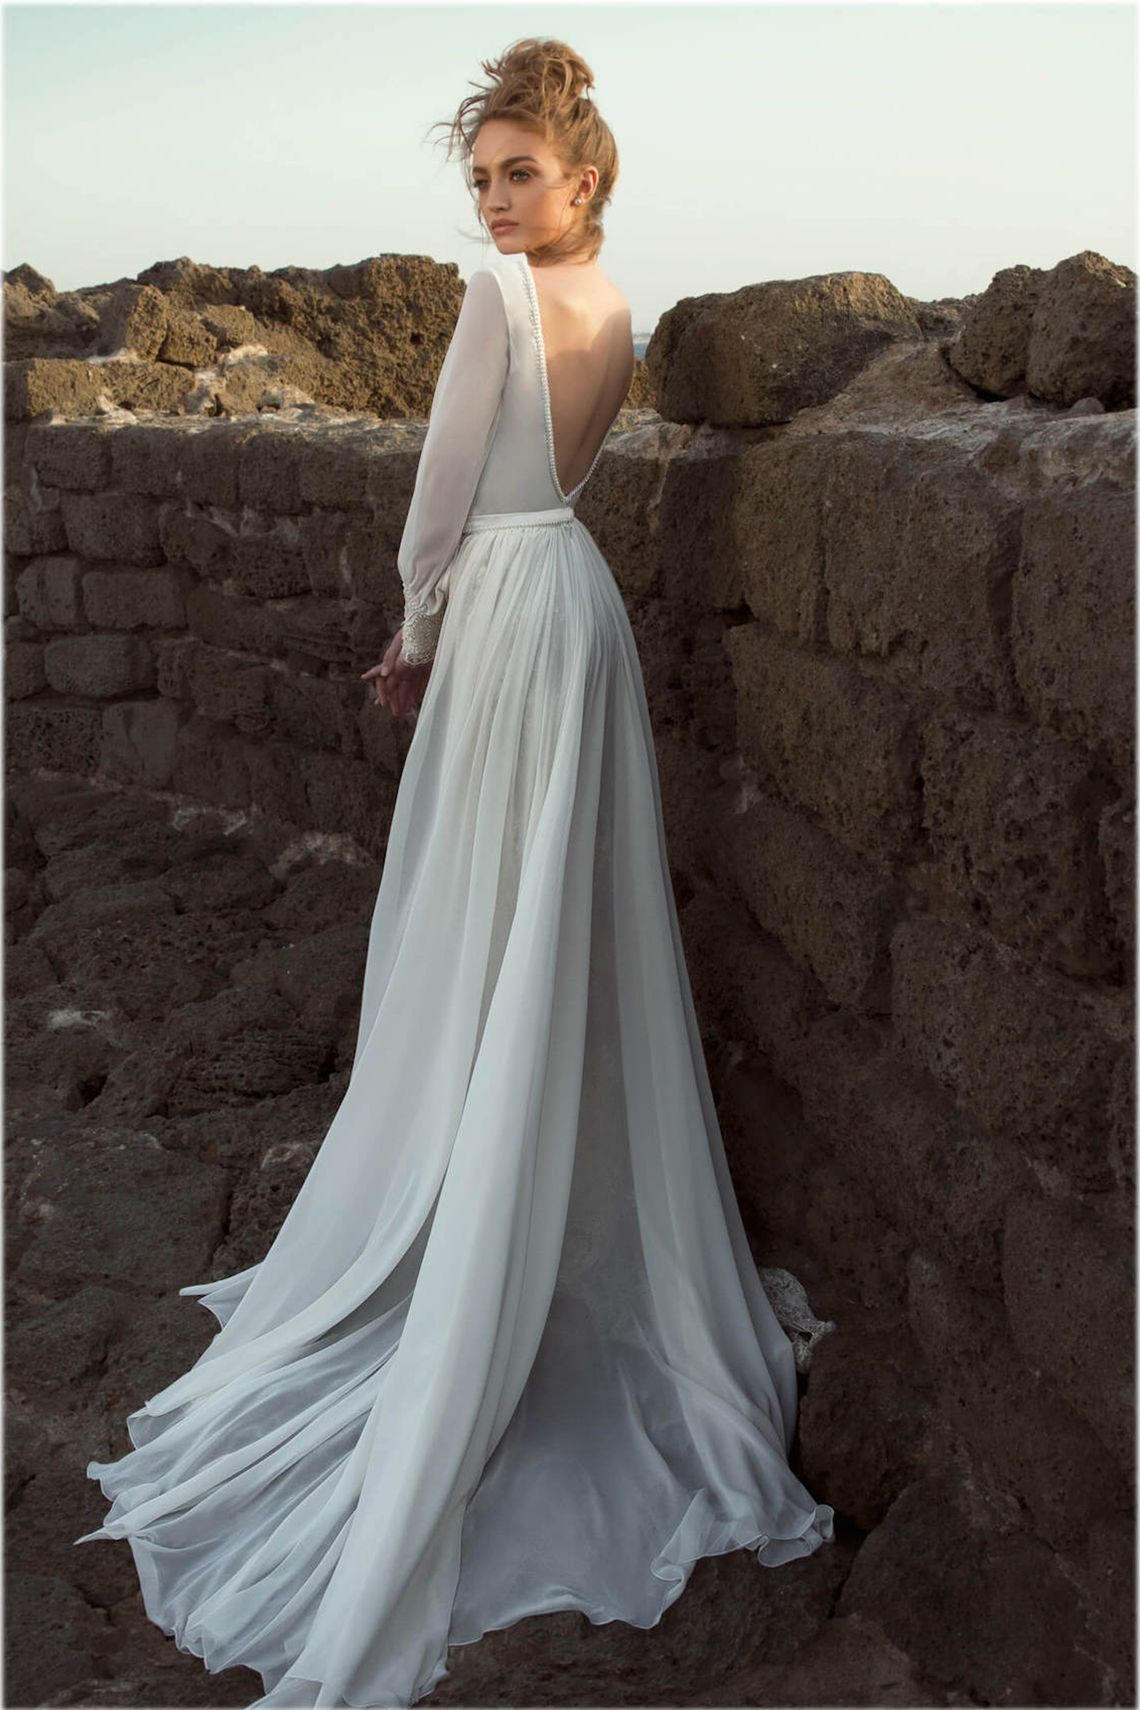 30 Stunning Long Sleeve Wedding Dresses Bridal Musings Wedding Dresses Wedding Dress Long Sleeve Trendy Wedding Dresses [ 1710 x 1140 Pixel ]